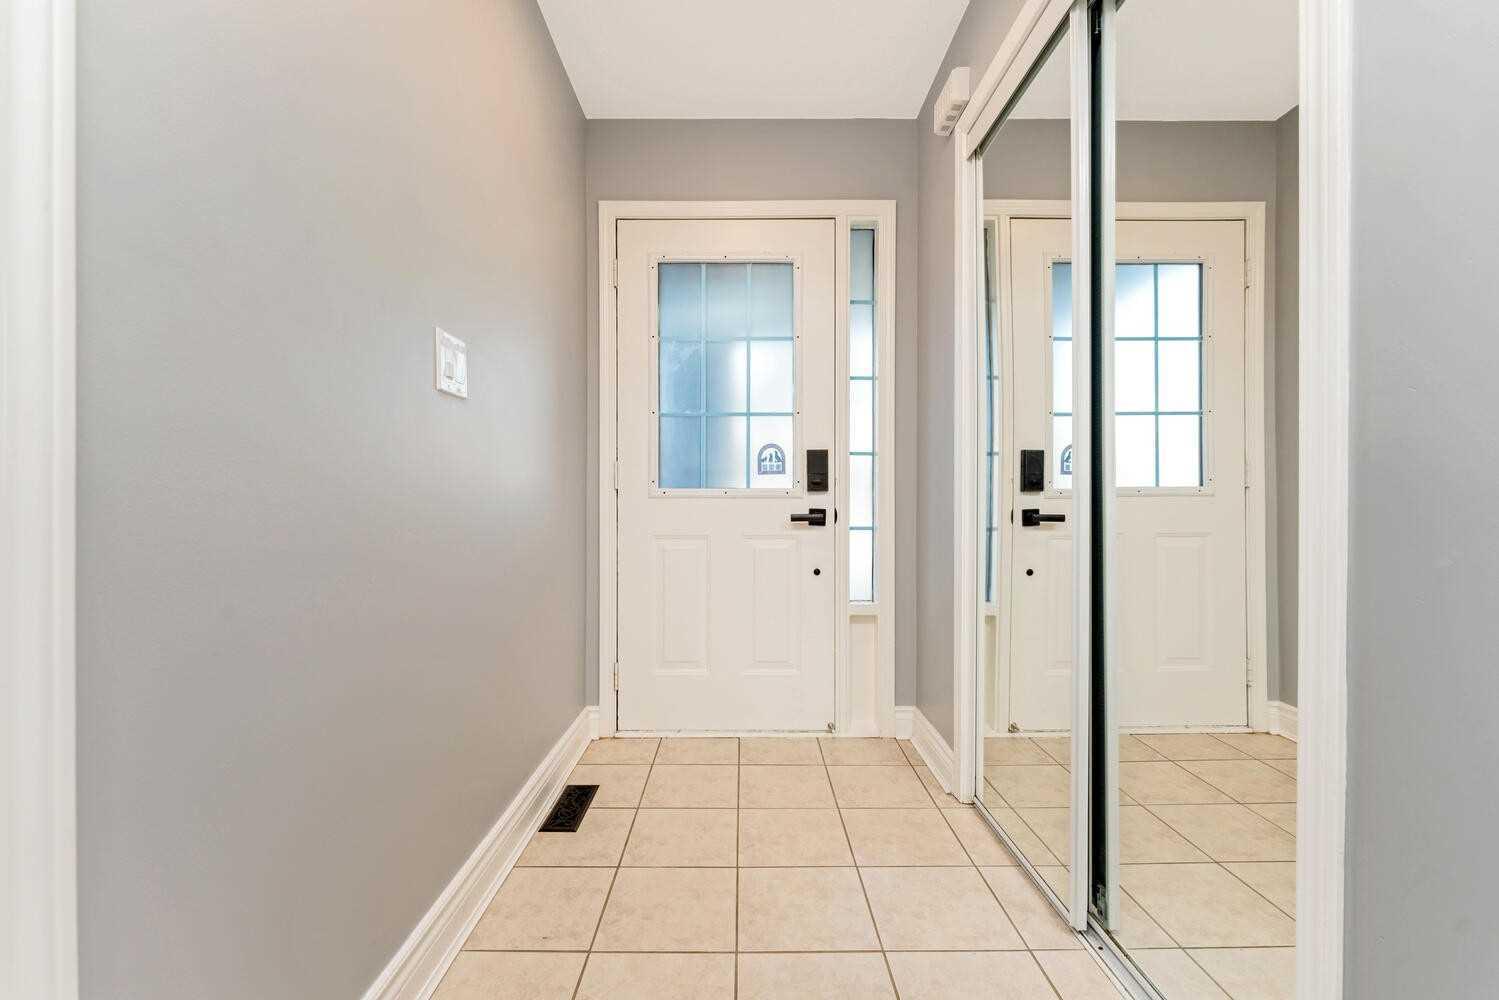 1030 Barclay Circ - Beaty Att/Row/Twnhouse for sale, 3 Bedrooms (W5400435) - #2